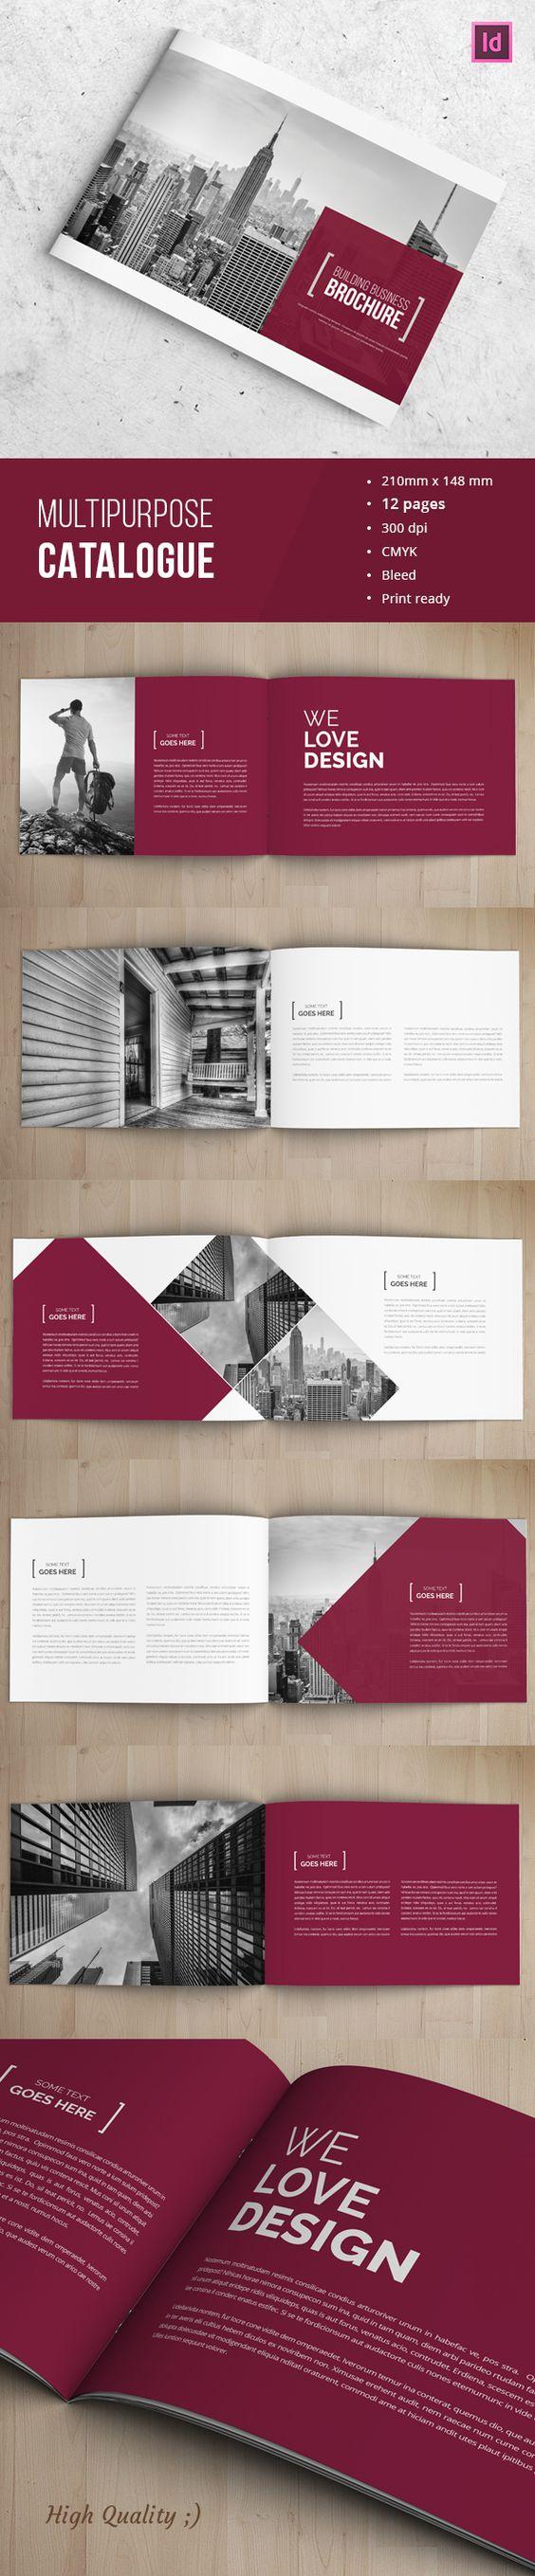 Corporate Indesign Brochure on Behance